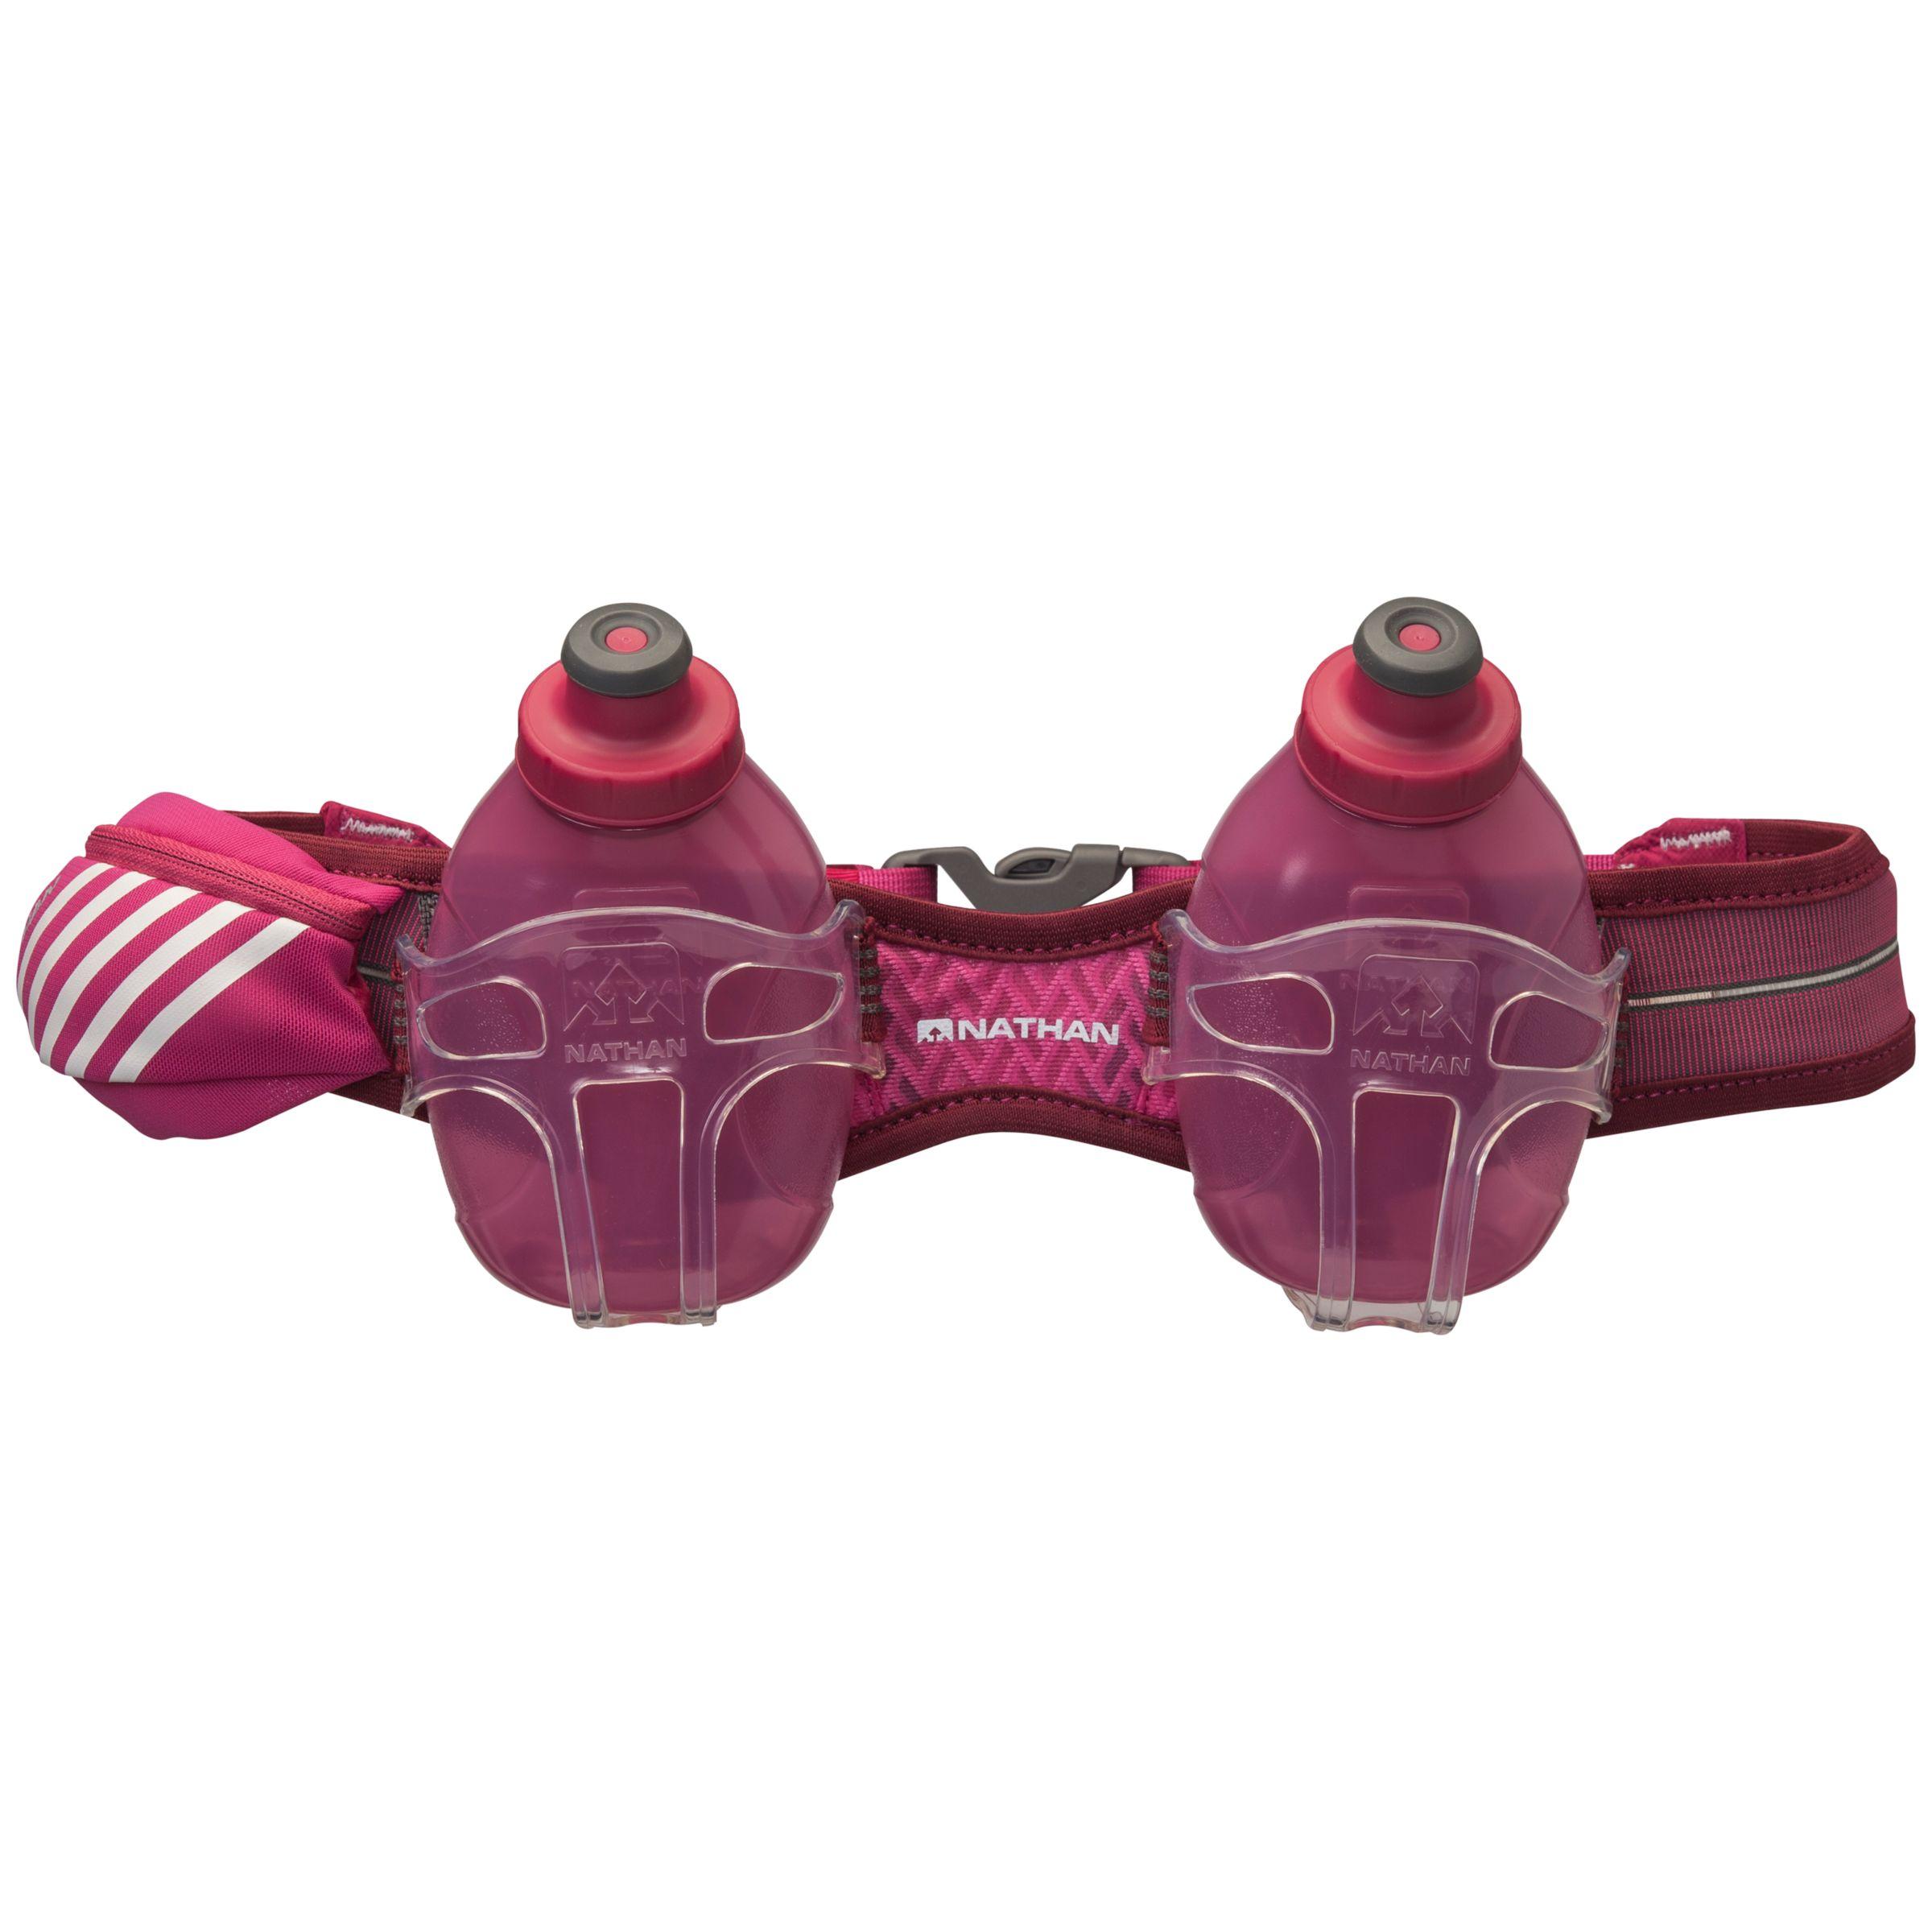 Nathan Nathan Mercury 2 Hydration Belt, Pink